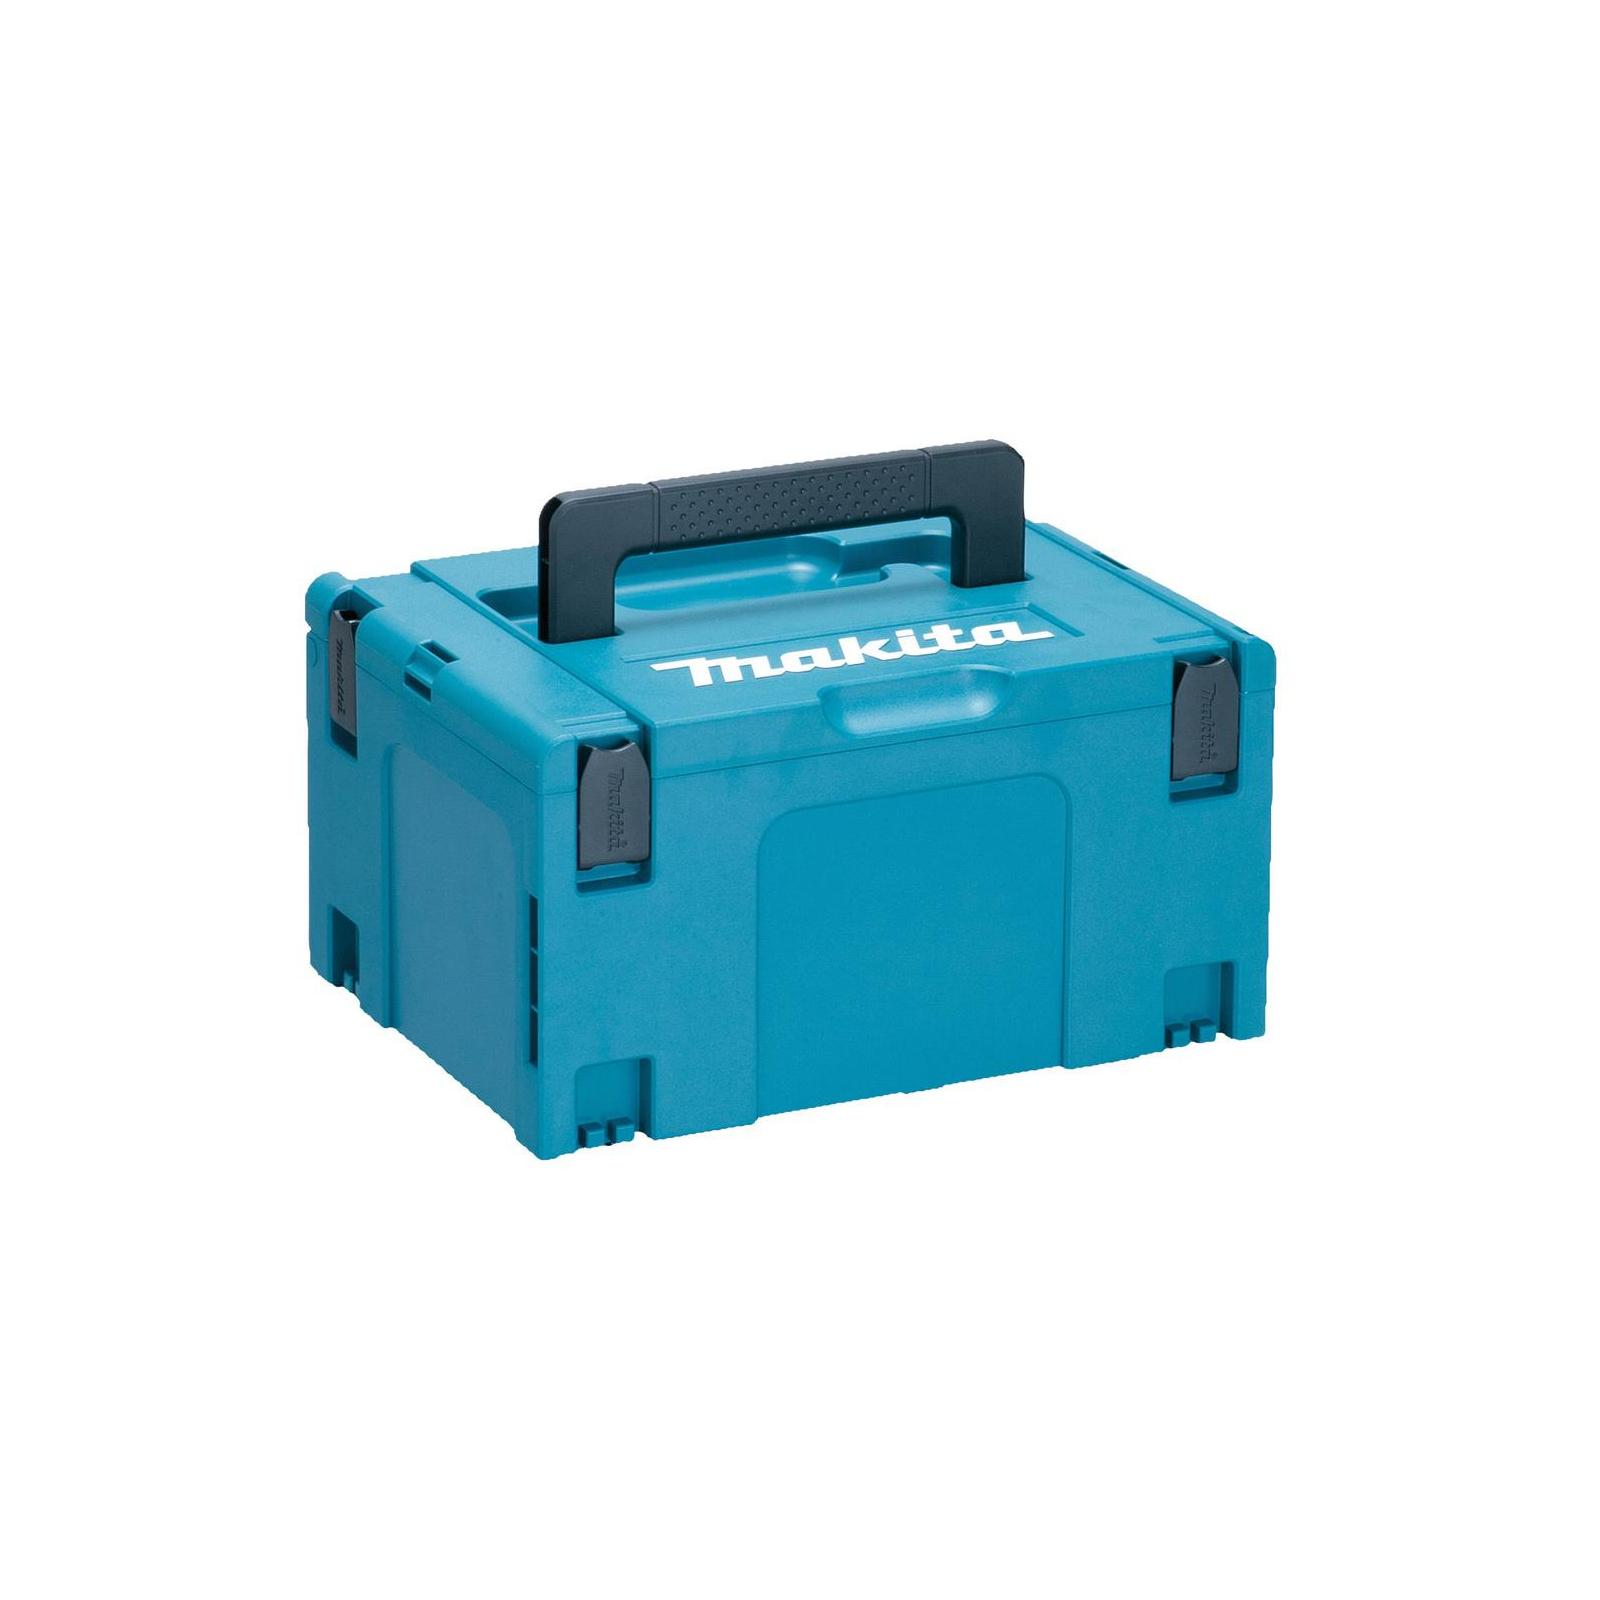 Аккумулятор к электроинструменту Makita LXT (BL1850Bx2, DC18RD, Makpac3) (197629-2) изображение 4